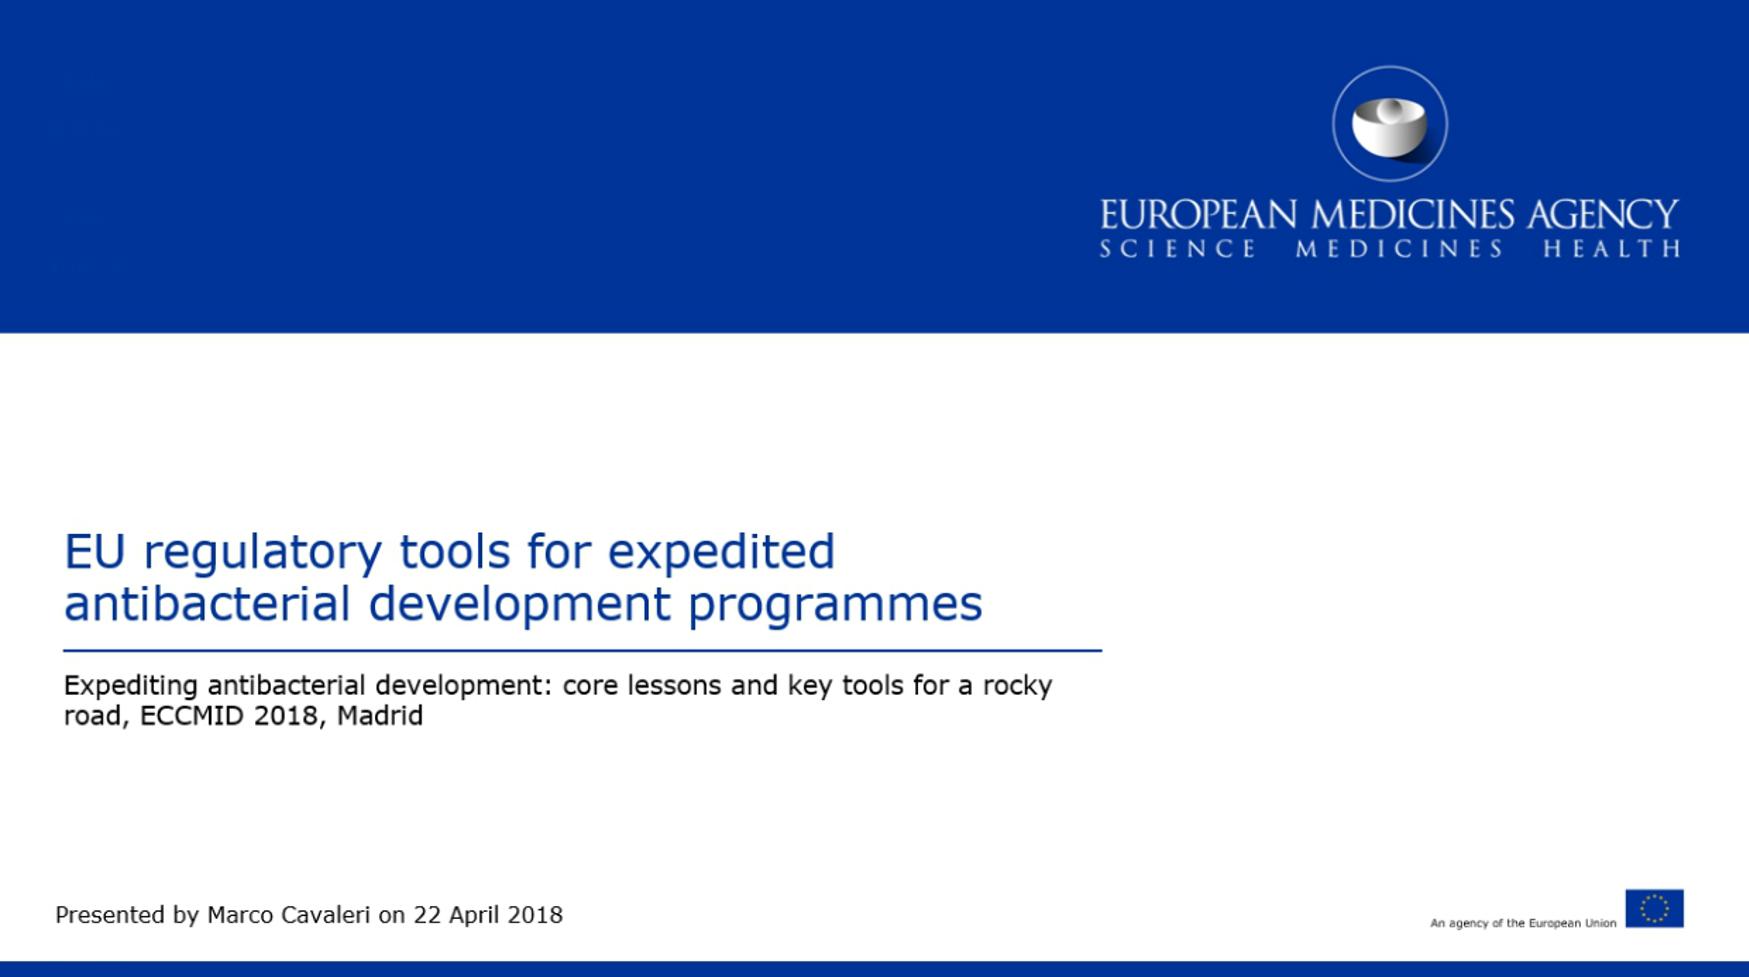 EU regulatory tools for expedited antibacterial development programmes